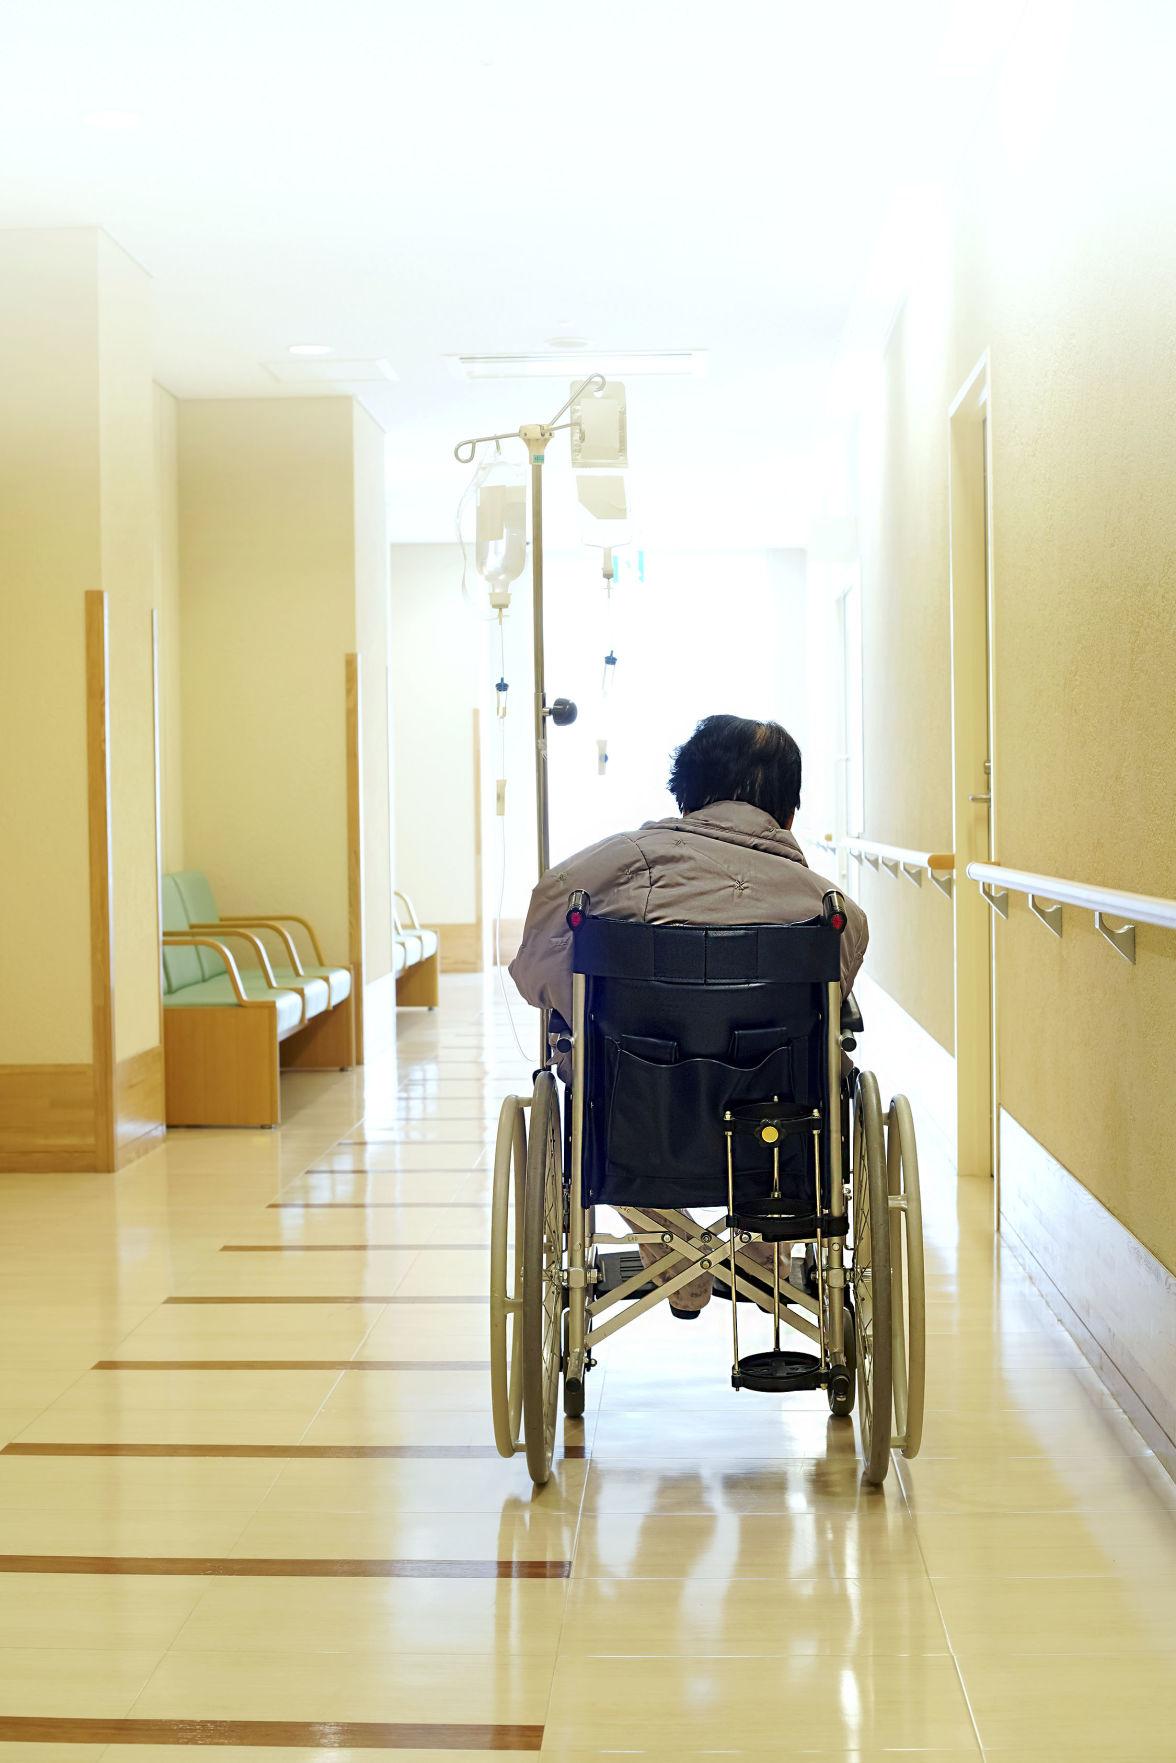 Medicare expansion